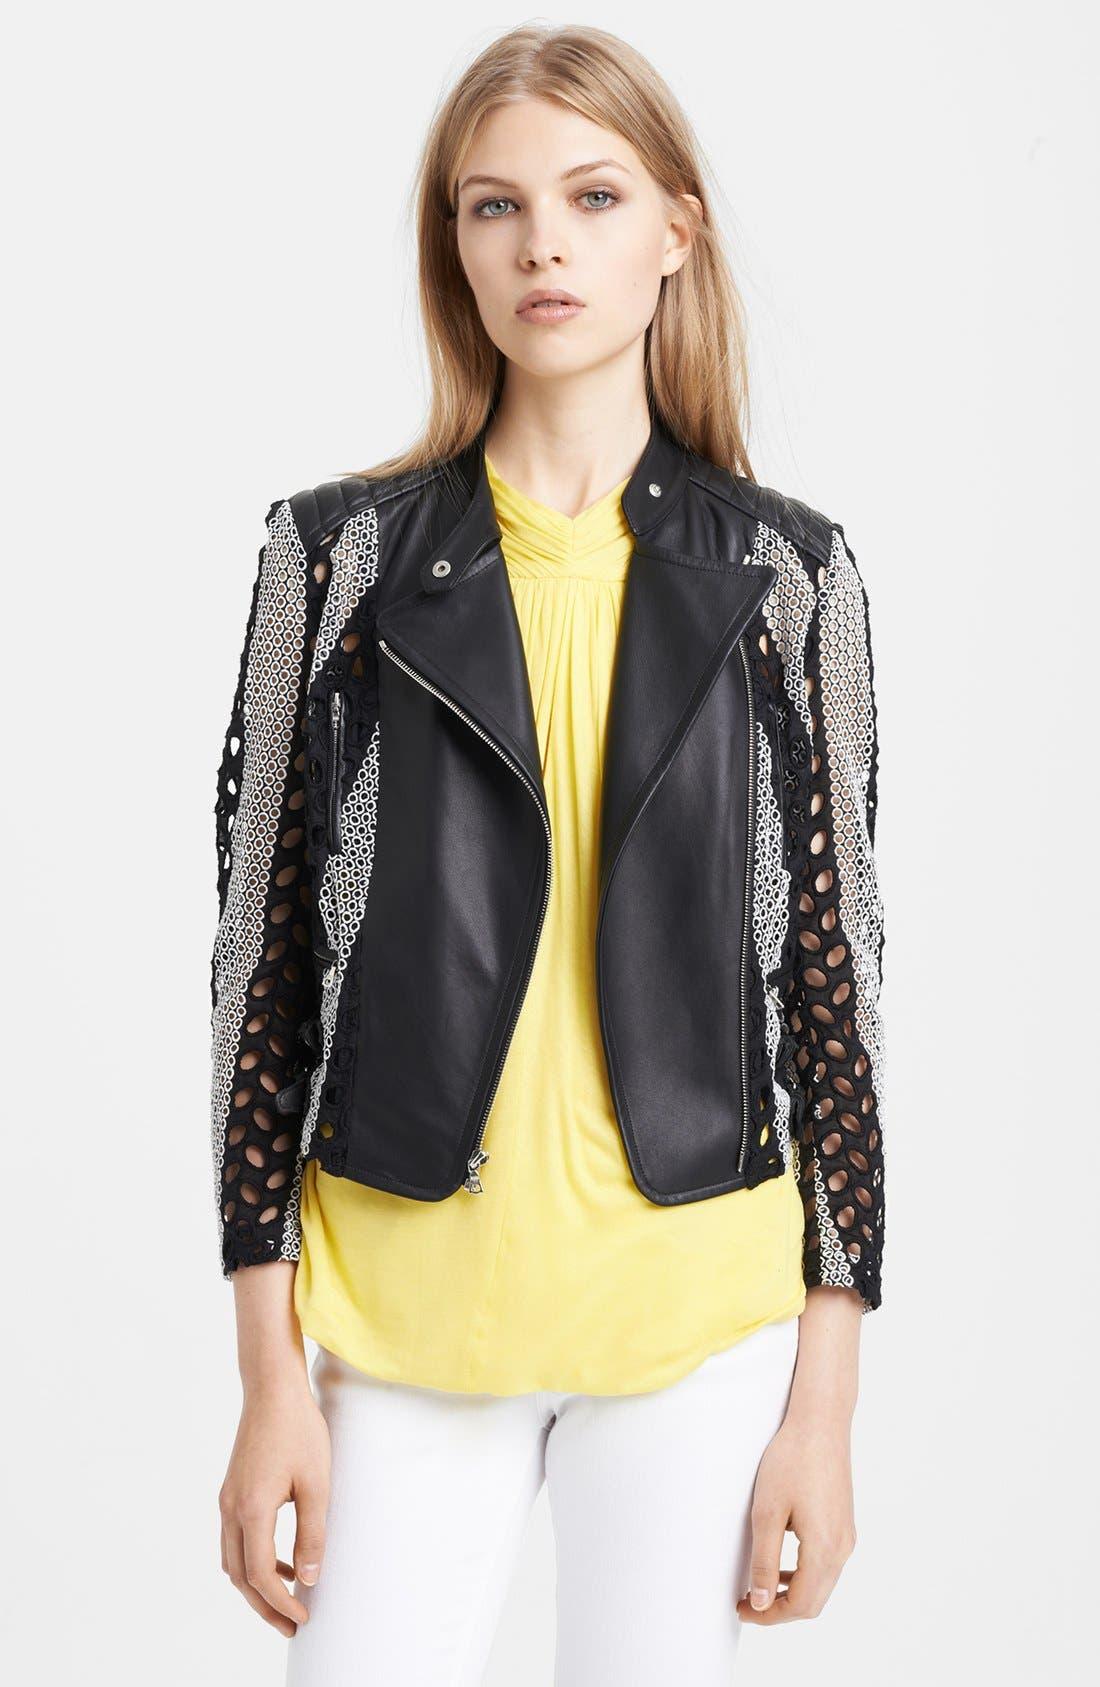 Alternate Image 1 Selected - Yigal Azrouël Cotton Eyelet & Leather Moto Jacket